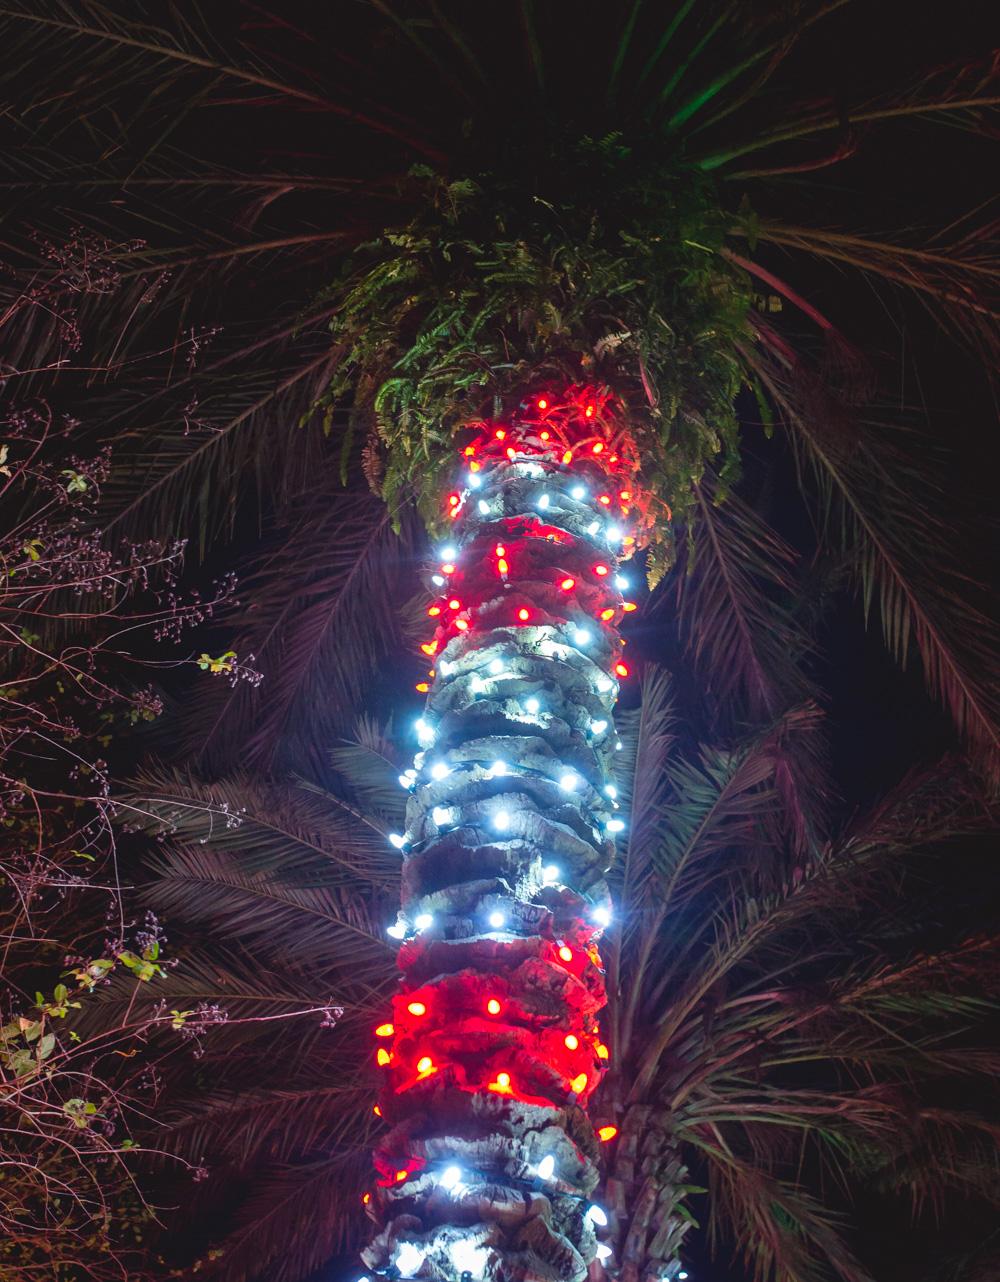 palma swiatelka